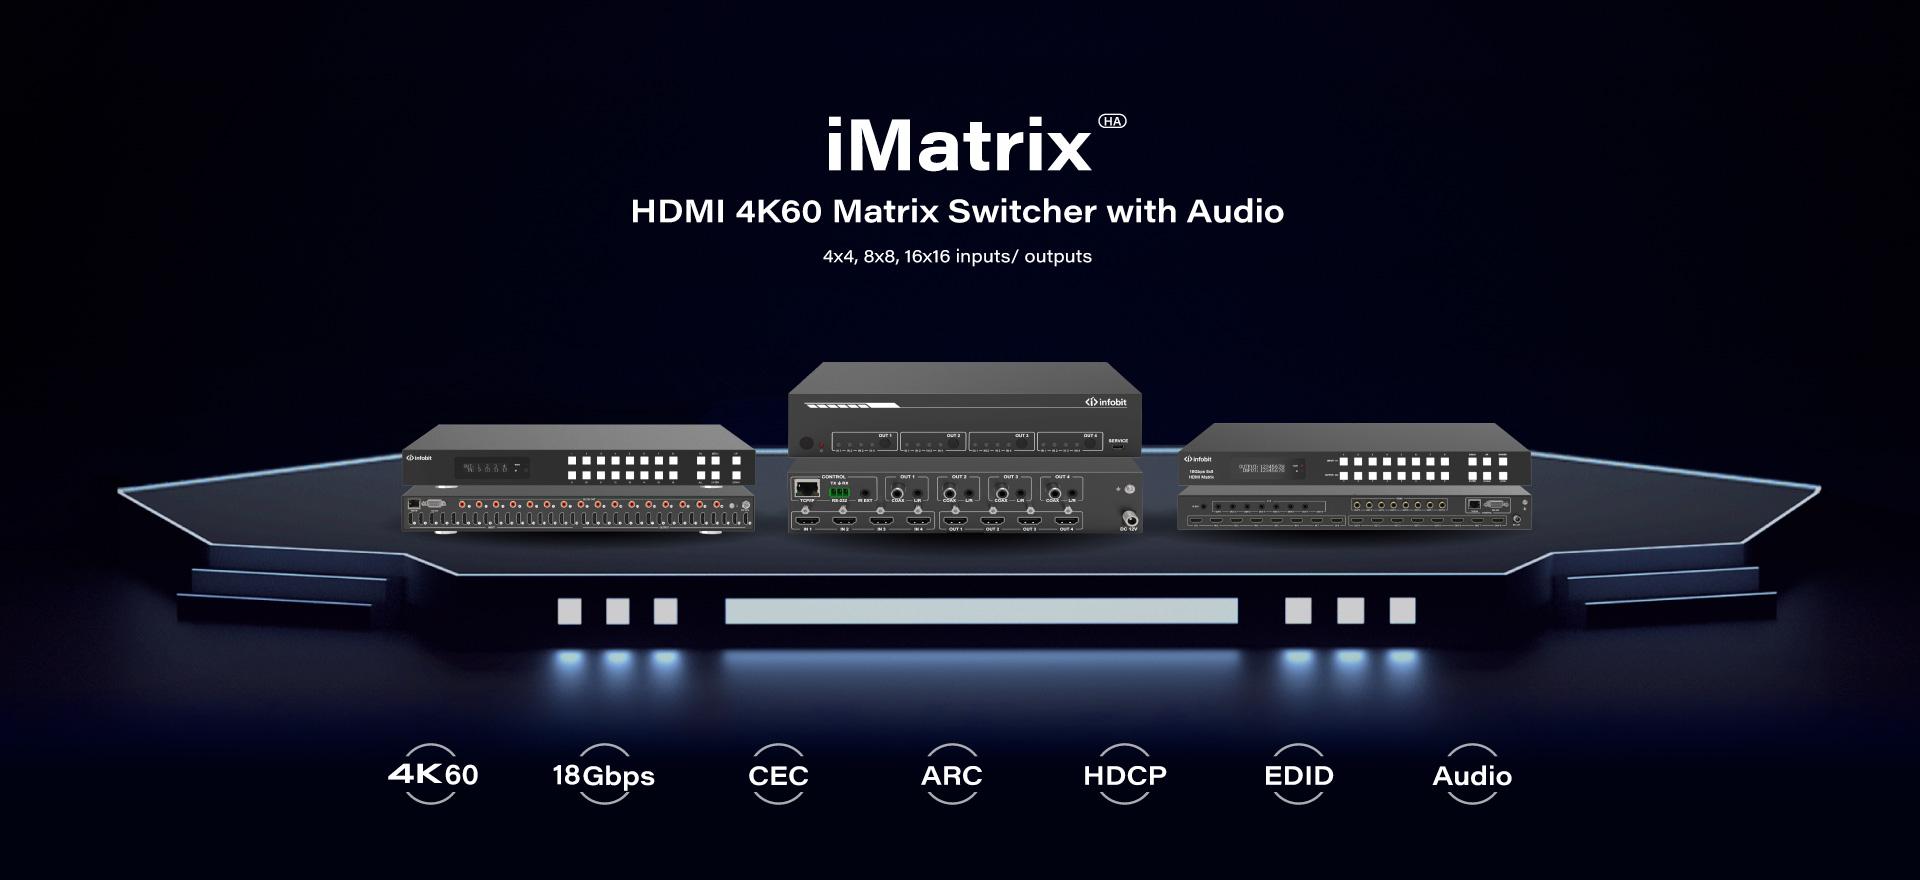 iMatrix HA HDMI 4K matrix switcher with audio